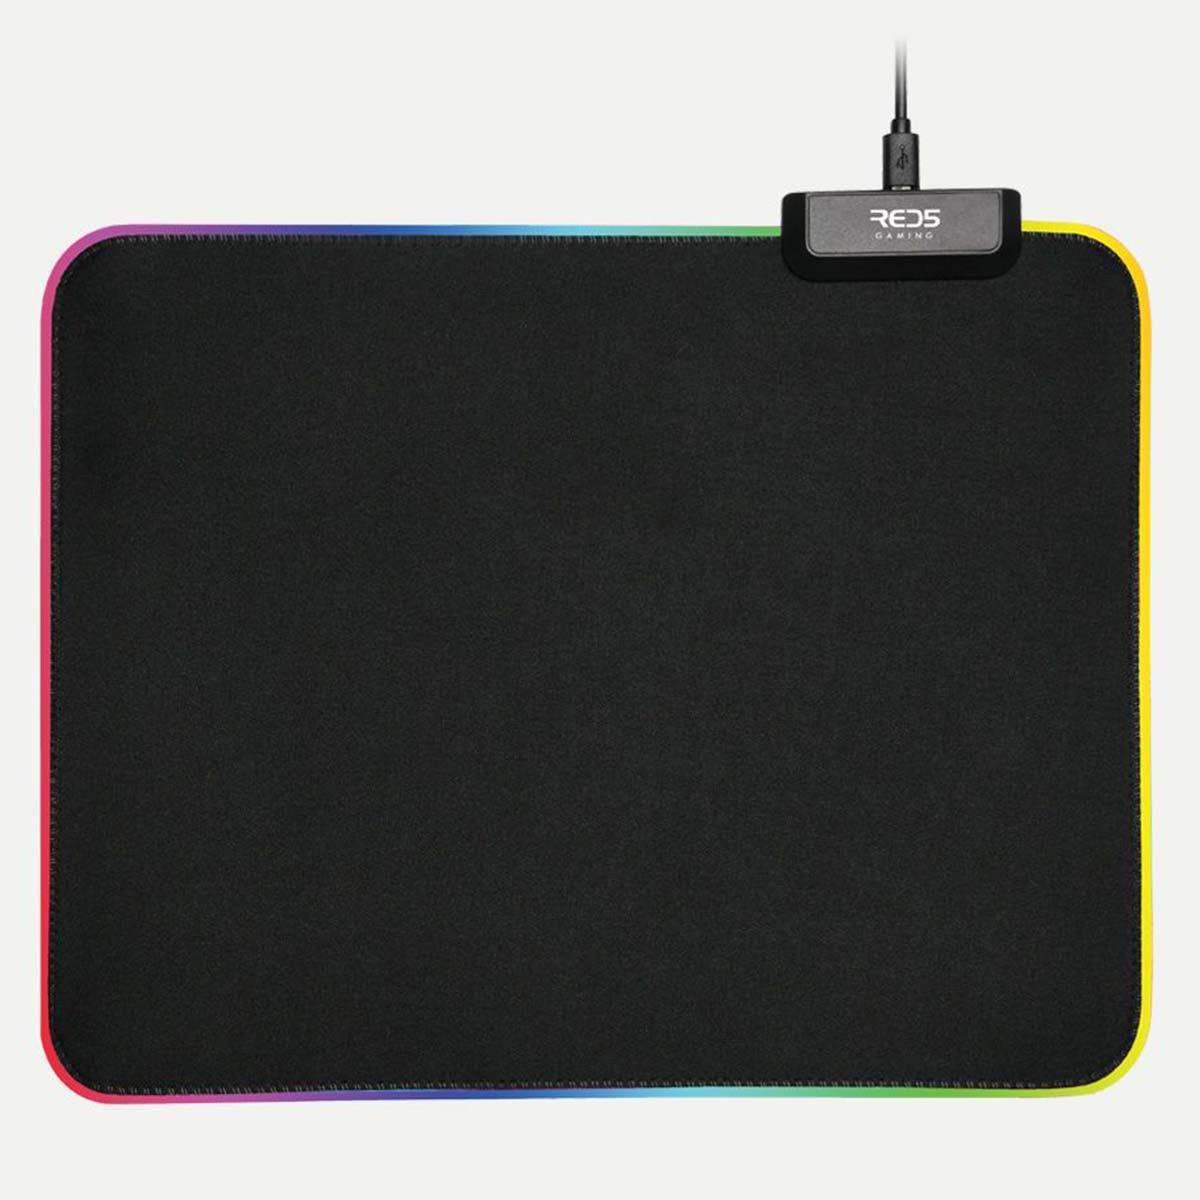 RED5 Light-Up Gaming Mouse Mat - Medium